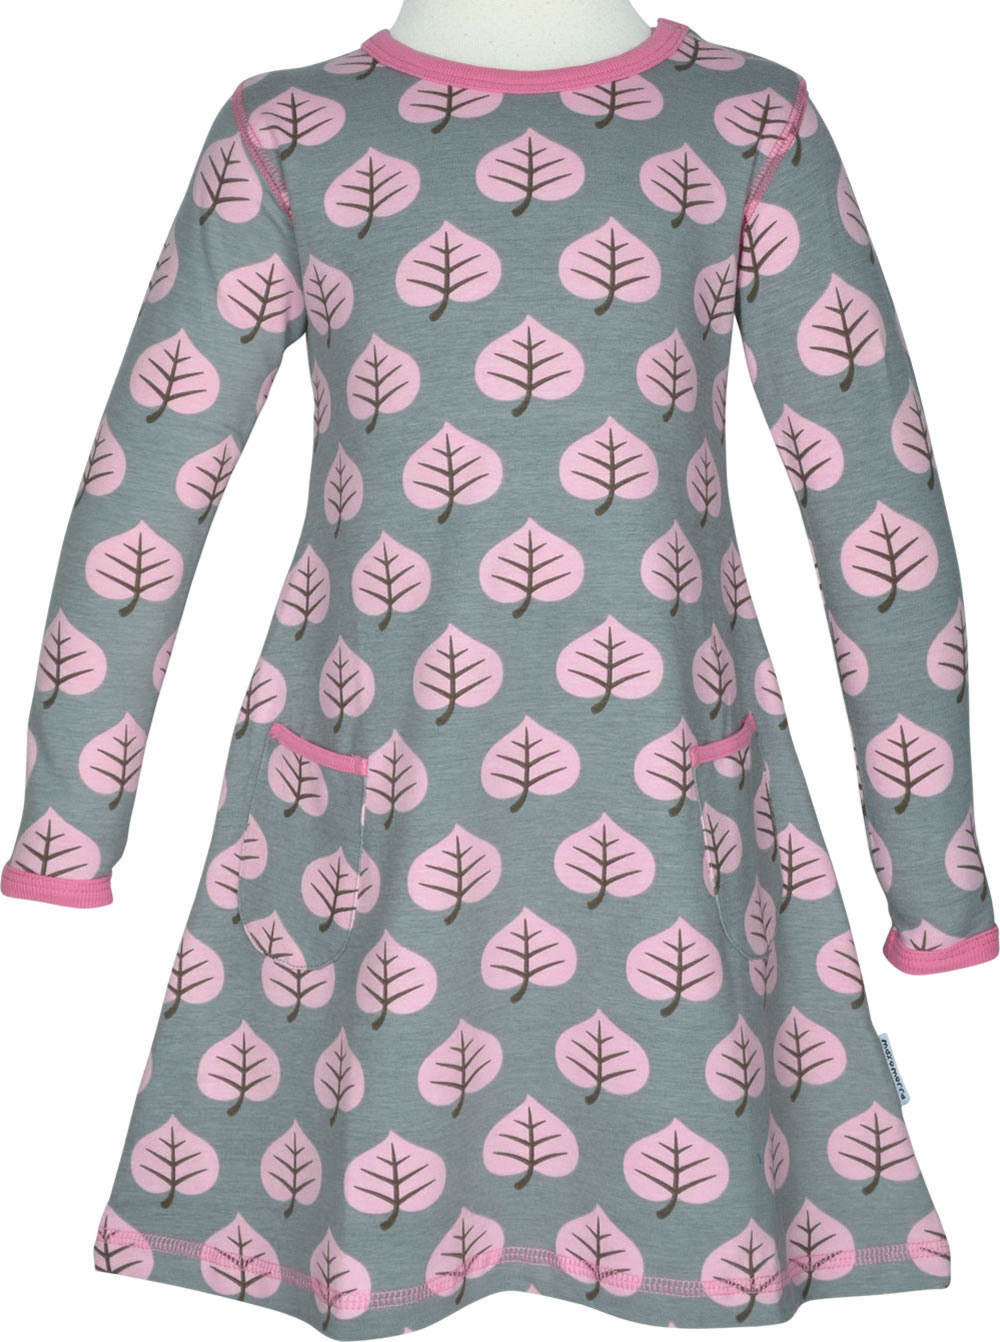 13 Coolste Kleid Grau Langarm Spezialgebiet Perfekt Kleid Grau Langarm Vertrieb